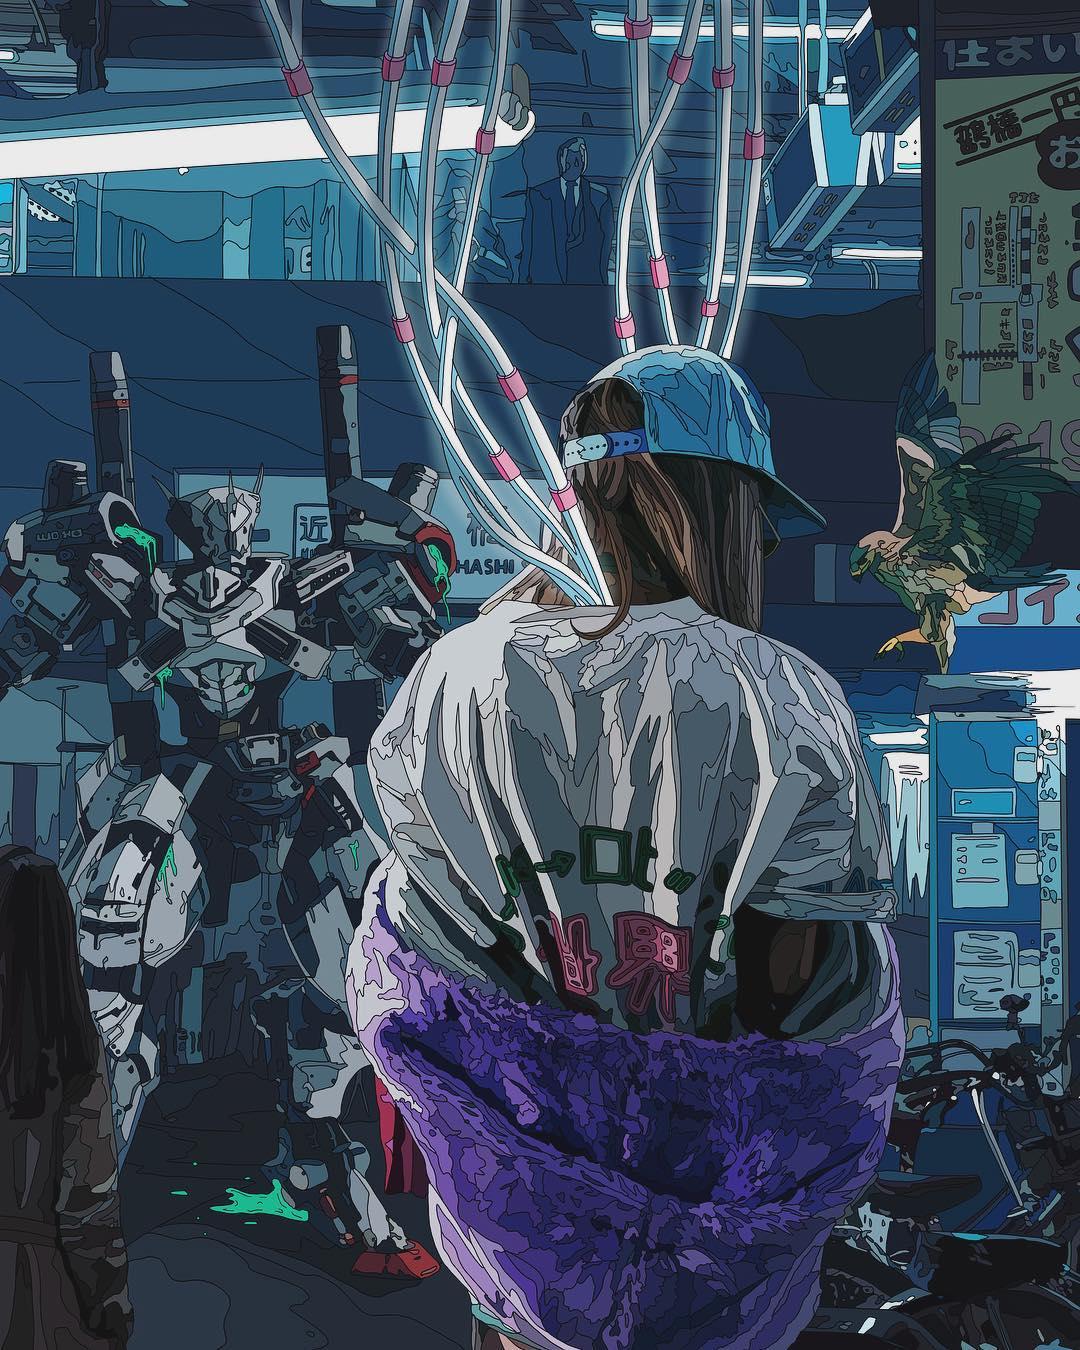 Mad-Dog-Jones-Michah Dowbak-Visual-Atelier-8-5.jpg